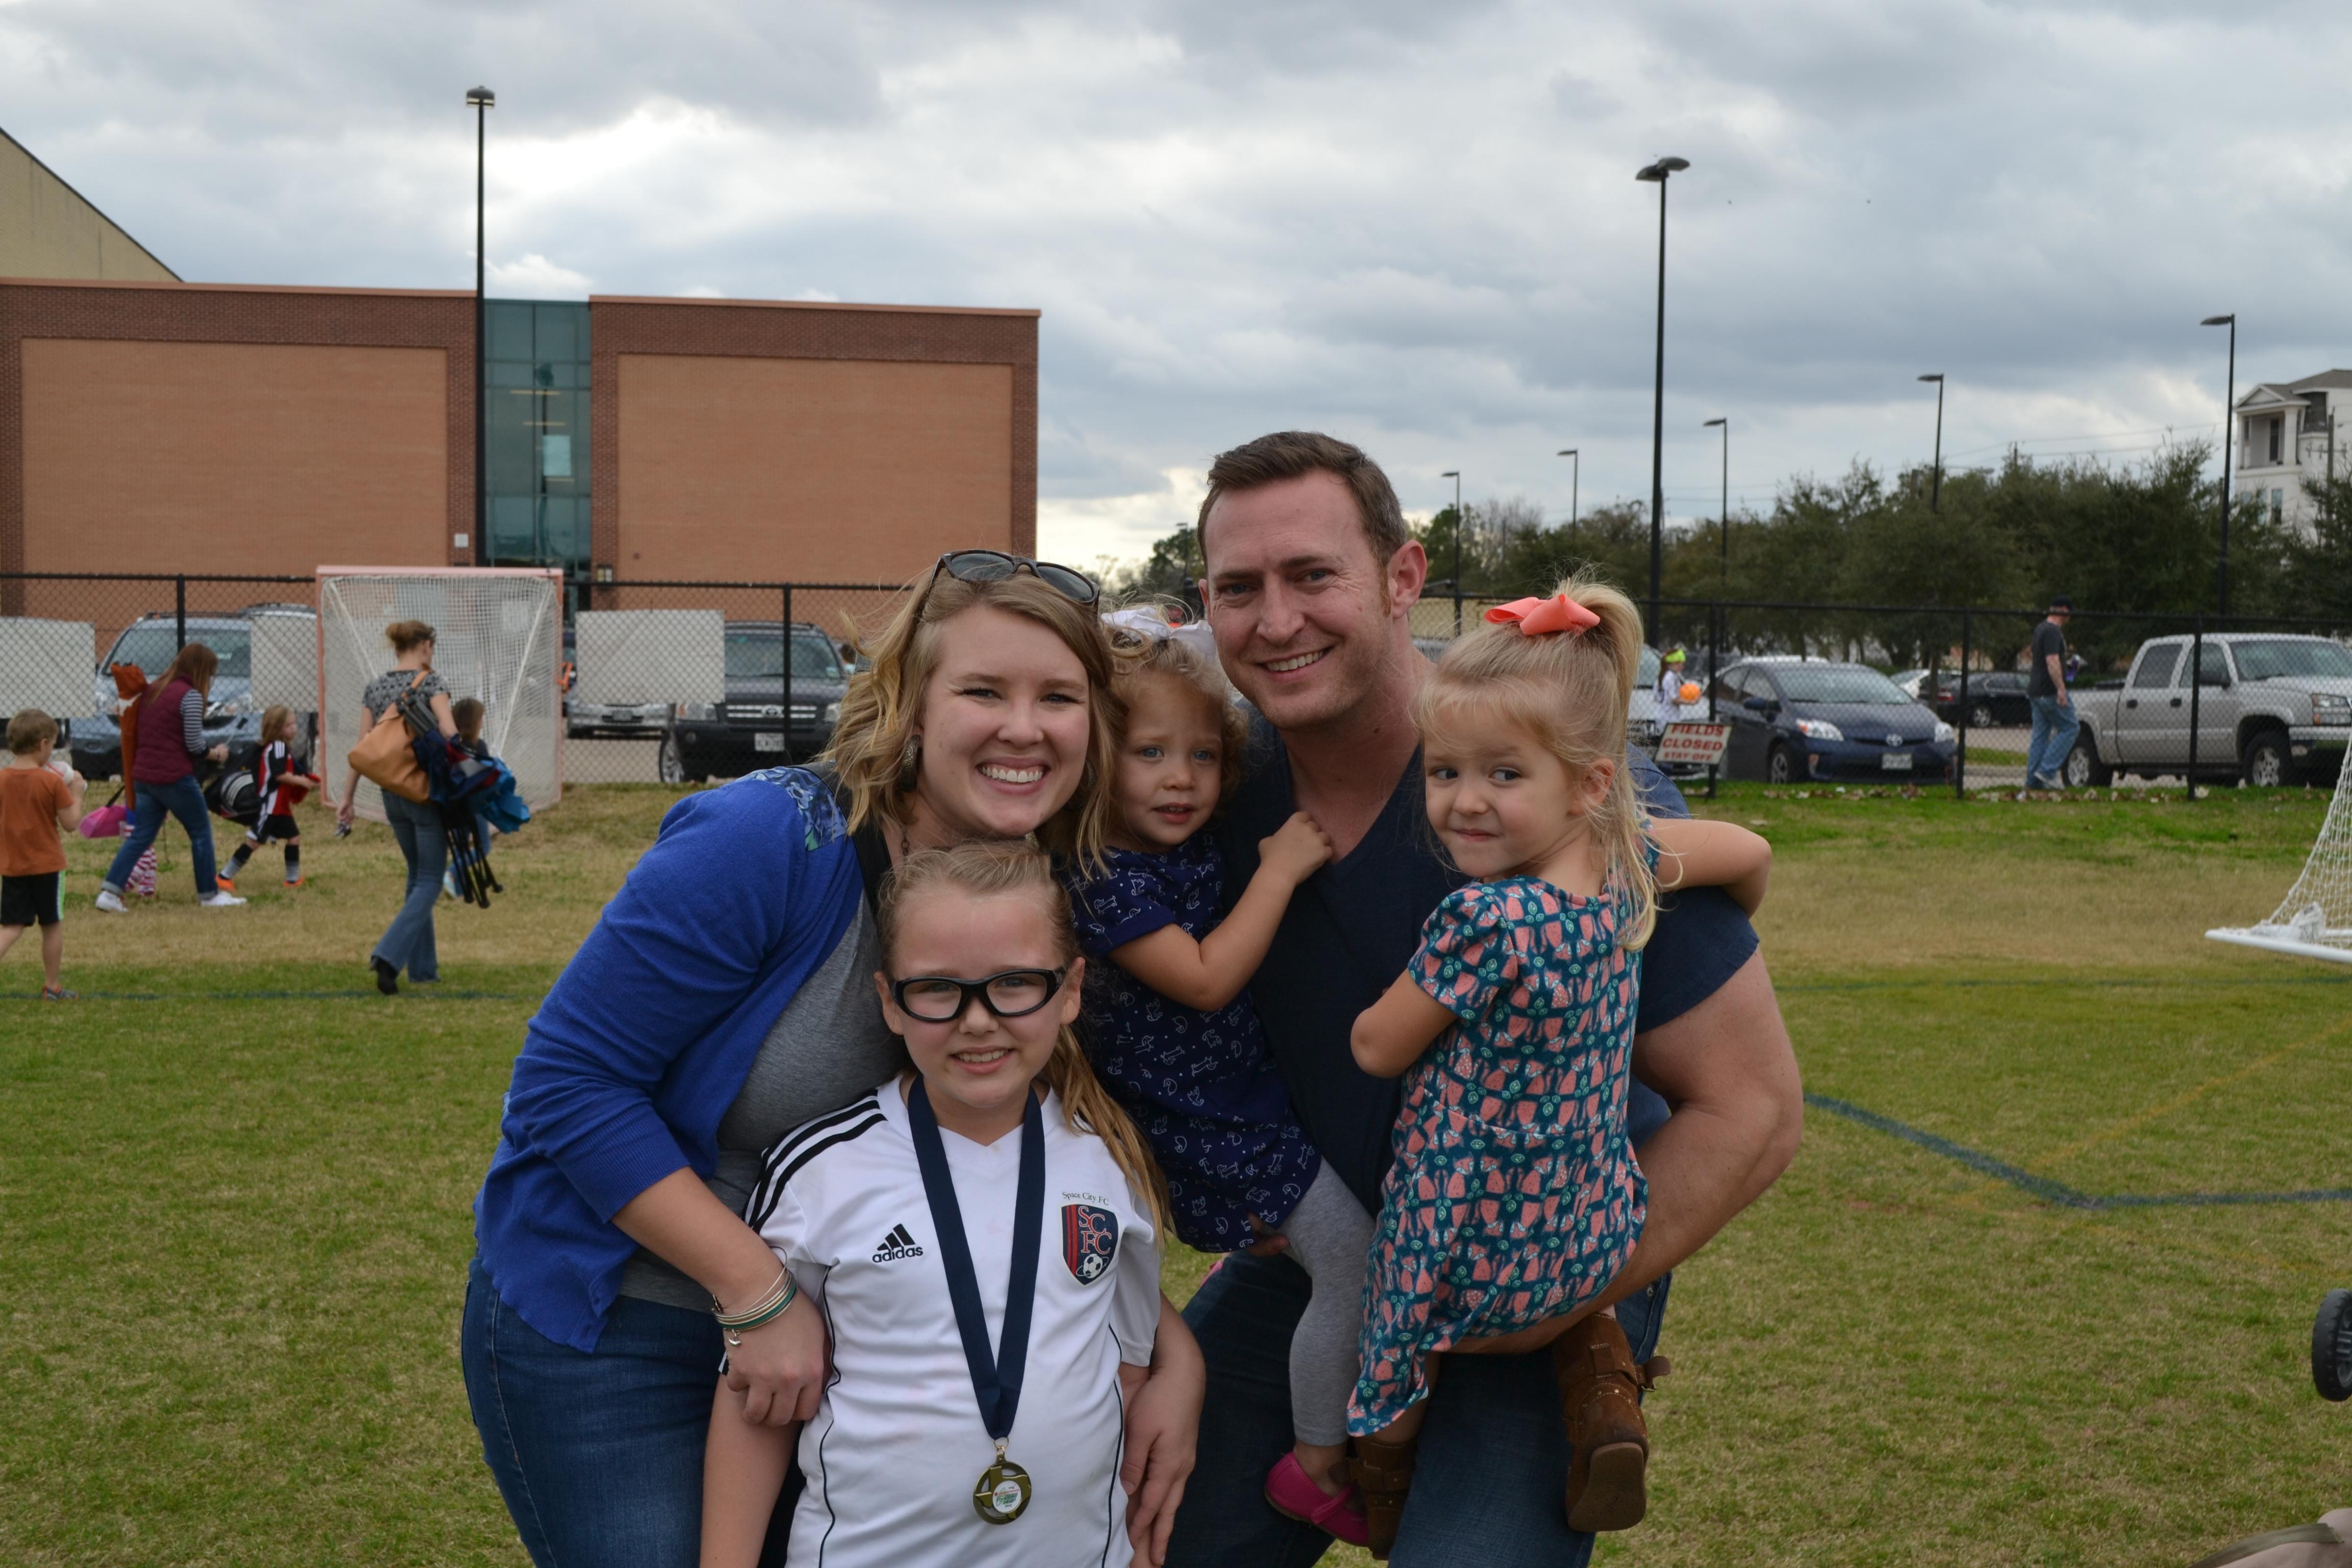 Family at Soccer